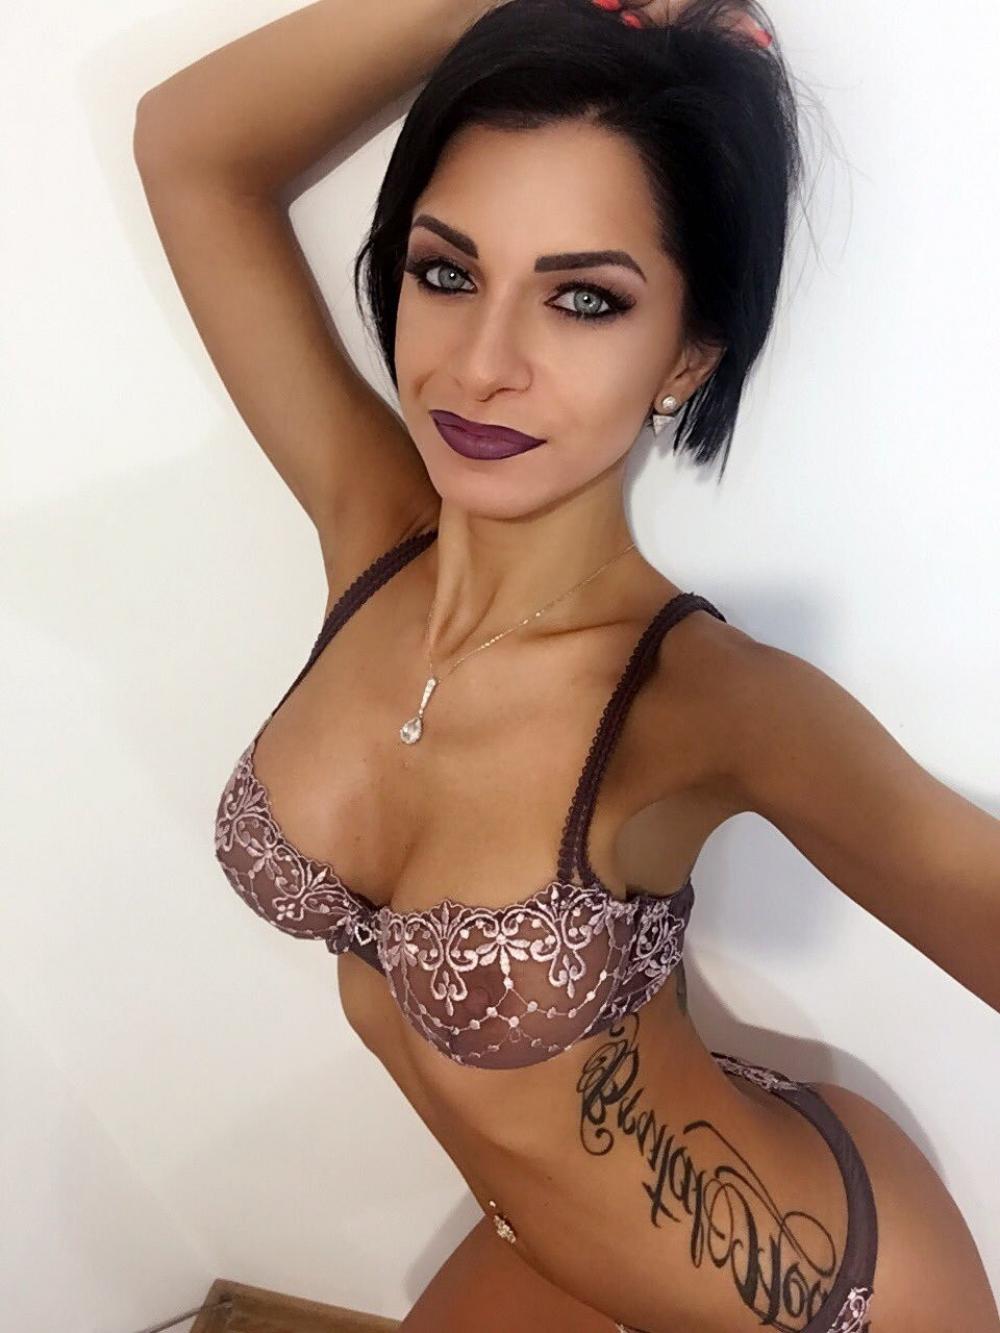 brazilian girl escort skype